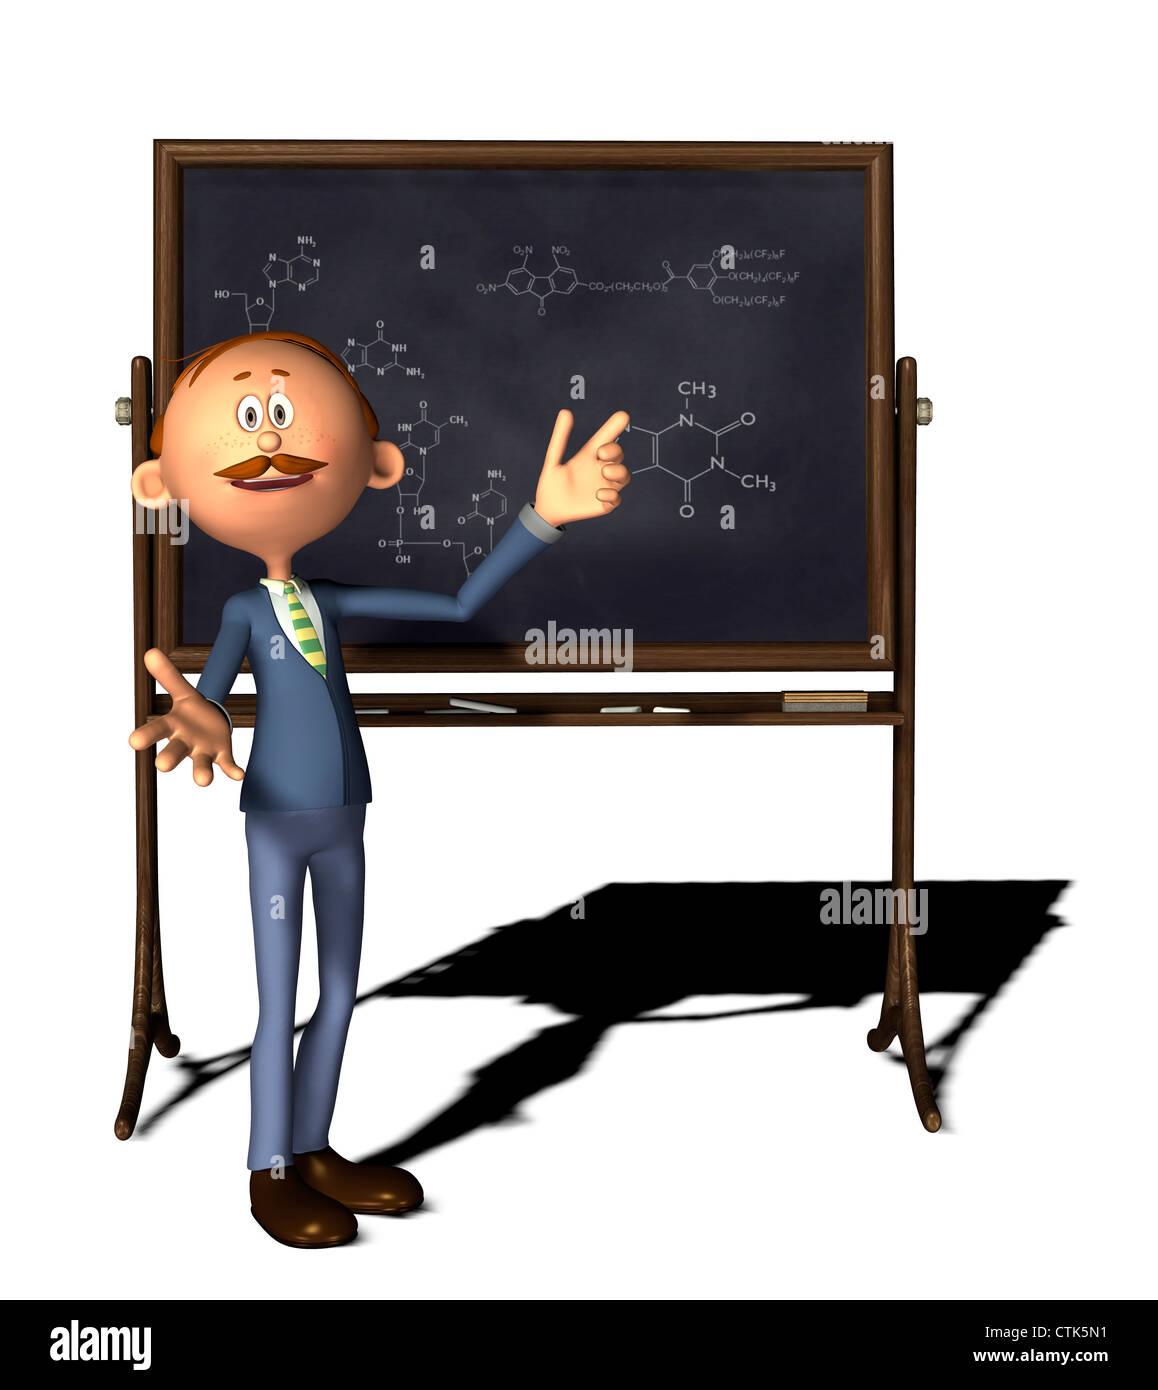 cartoon figure chemistry teacher with board and molecule formula - Stock Image